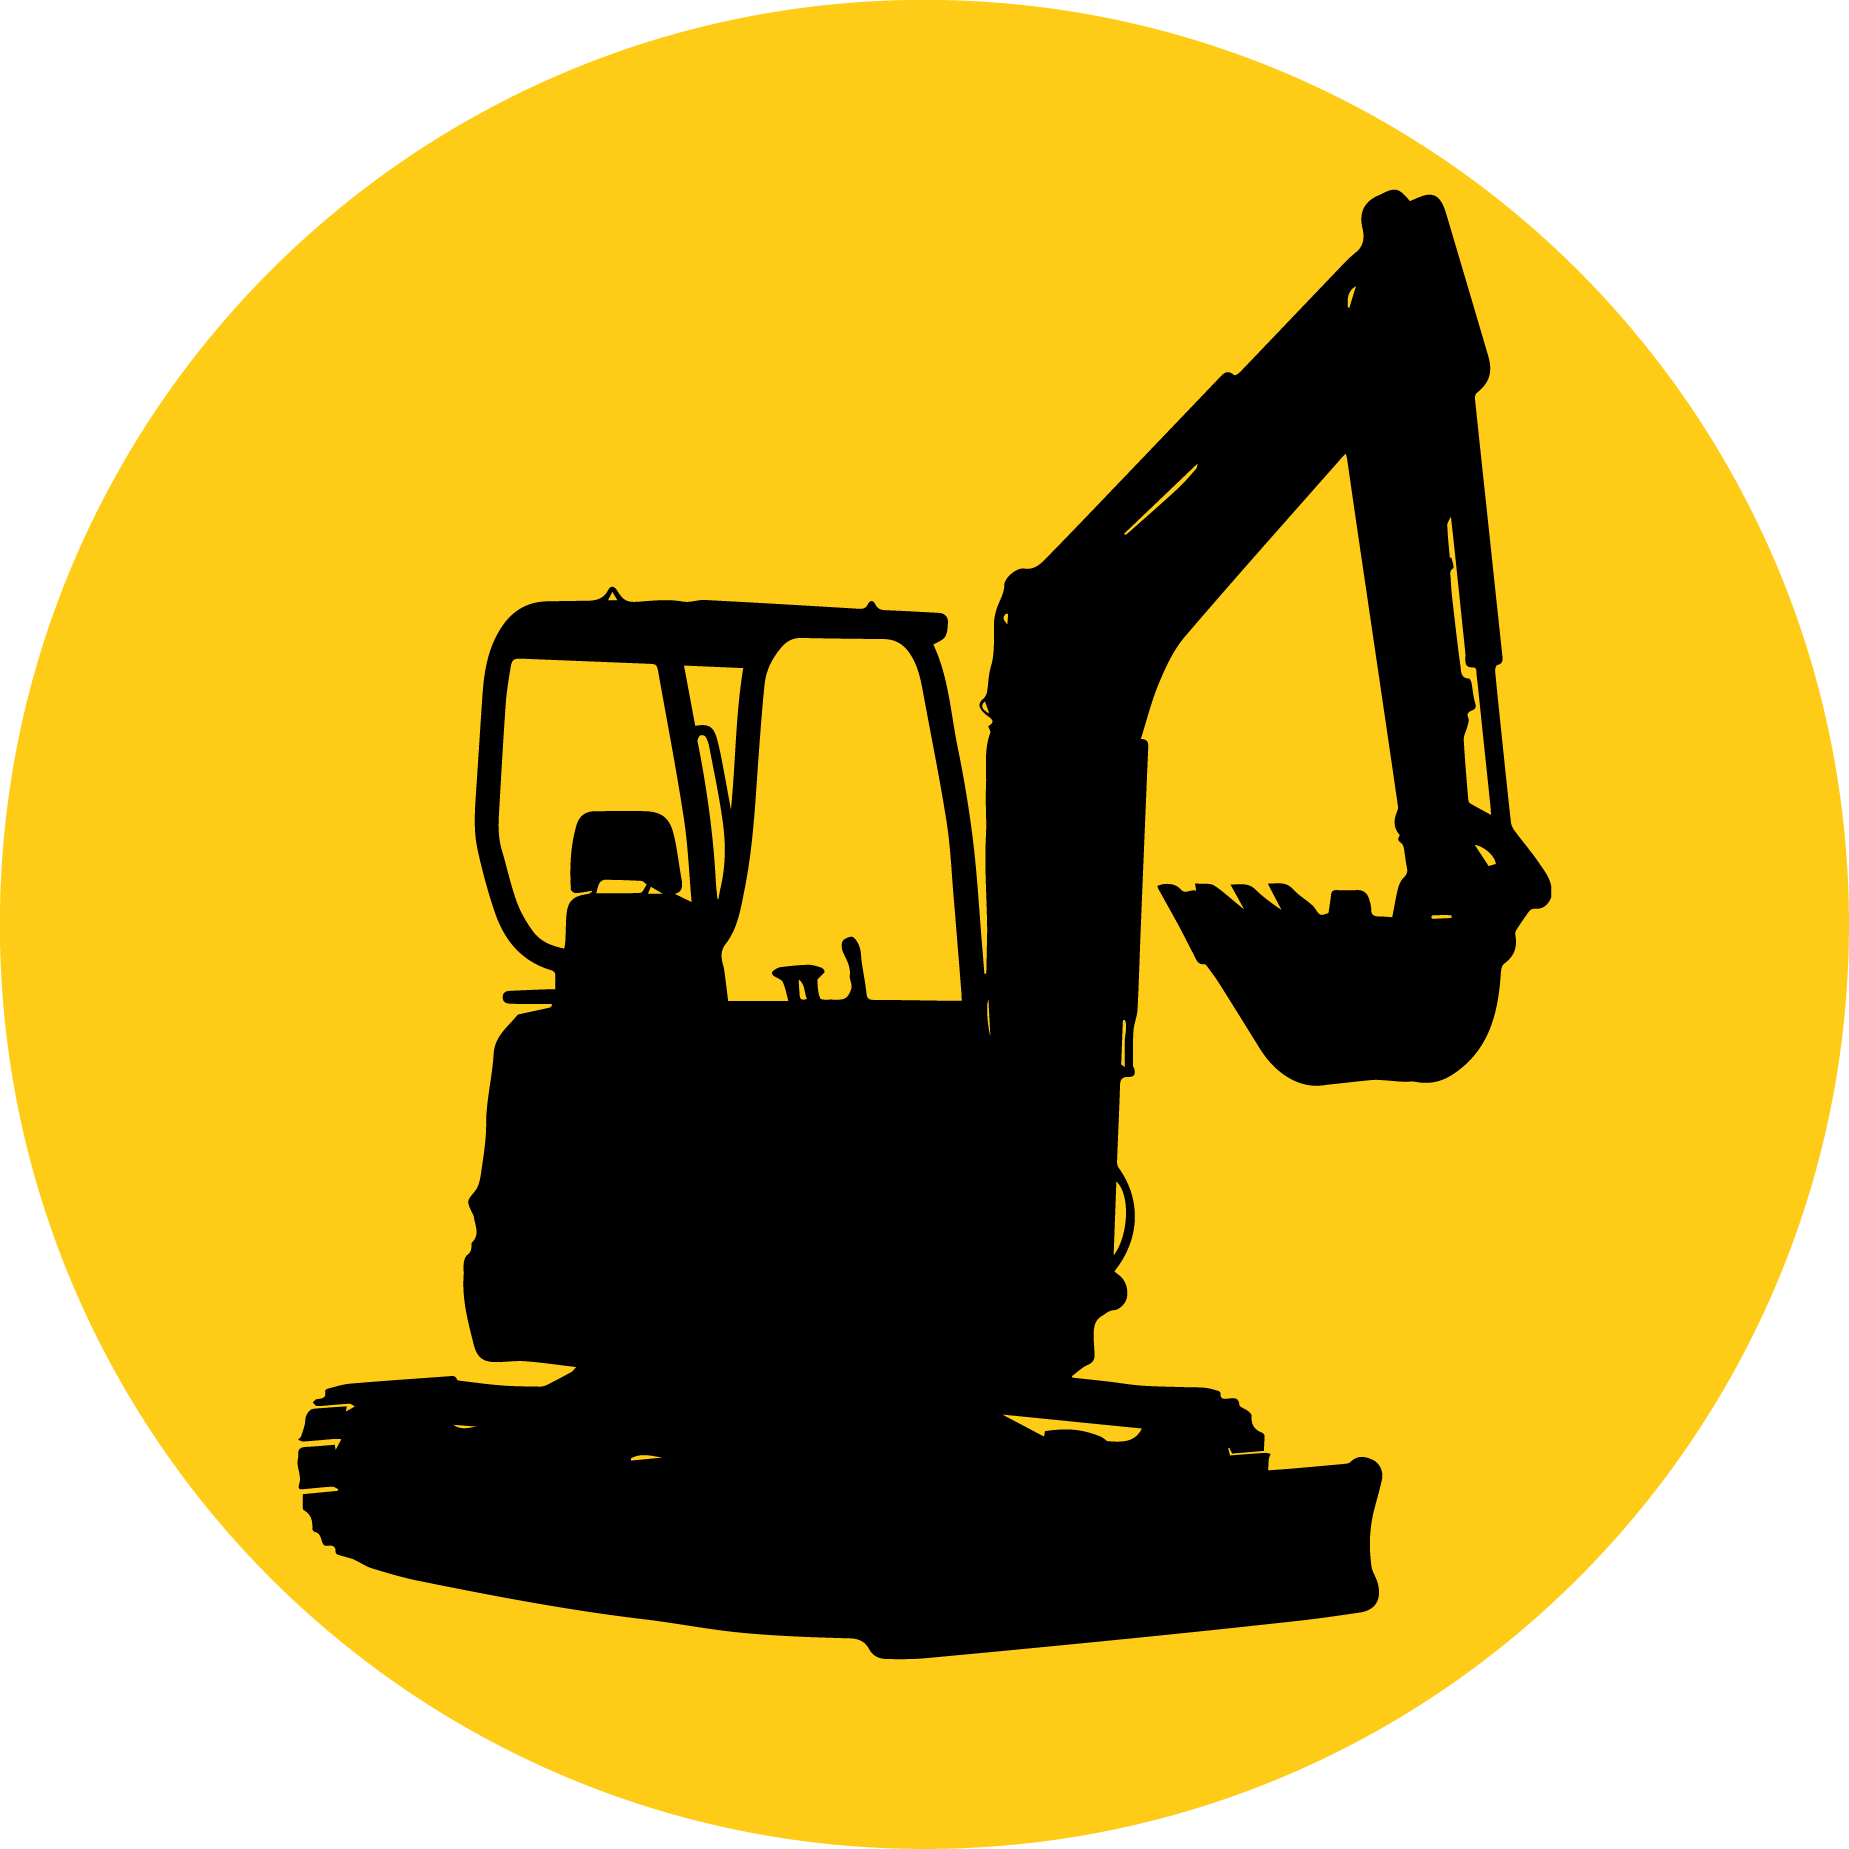 Compact excavator Kubota Corporation Architectural.